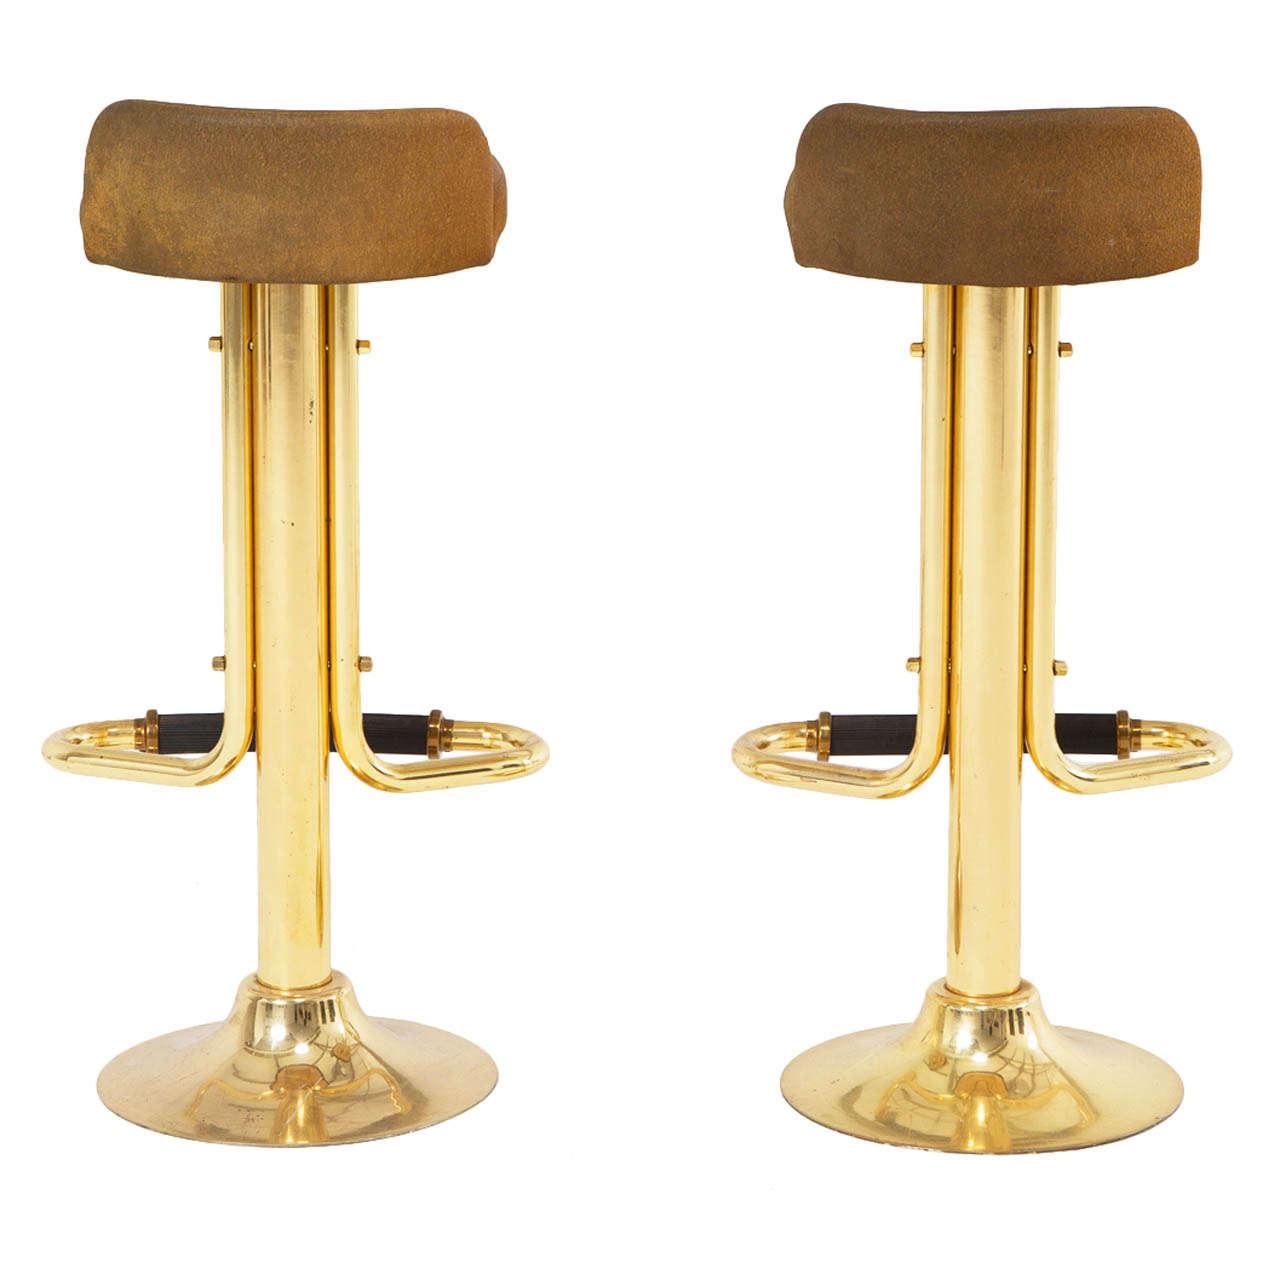 Pair Of Brass Coated Bar Stools At 1stdibs